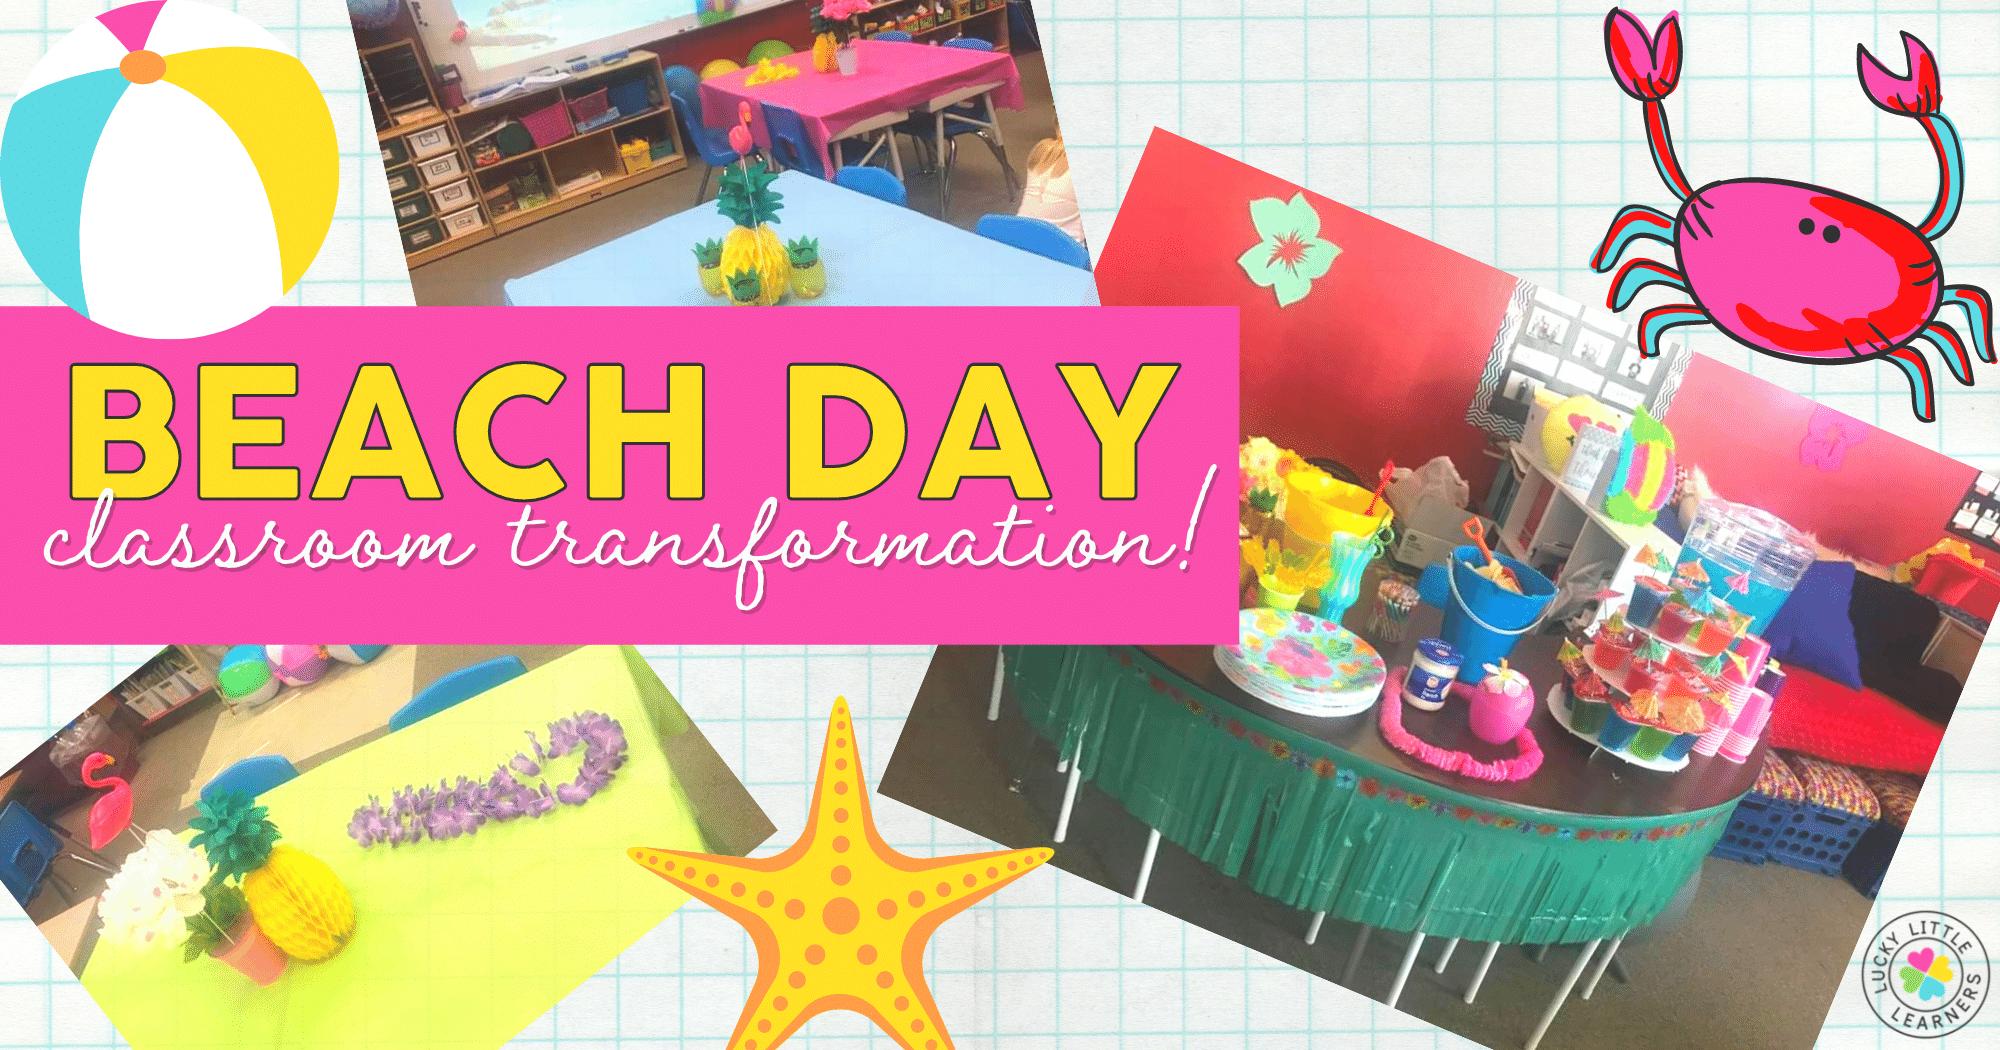 Beach Day Classroom Transformation